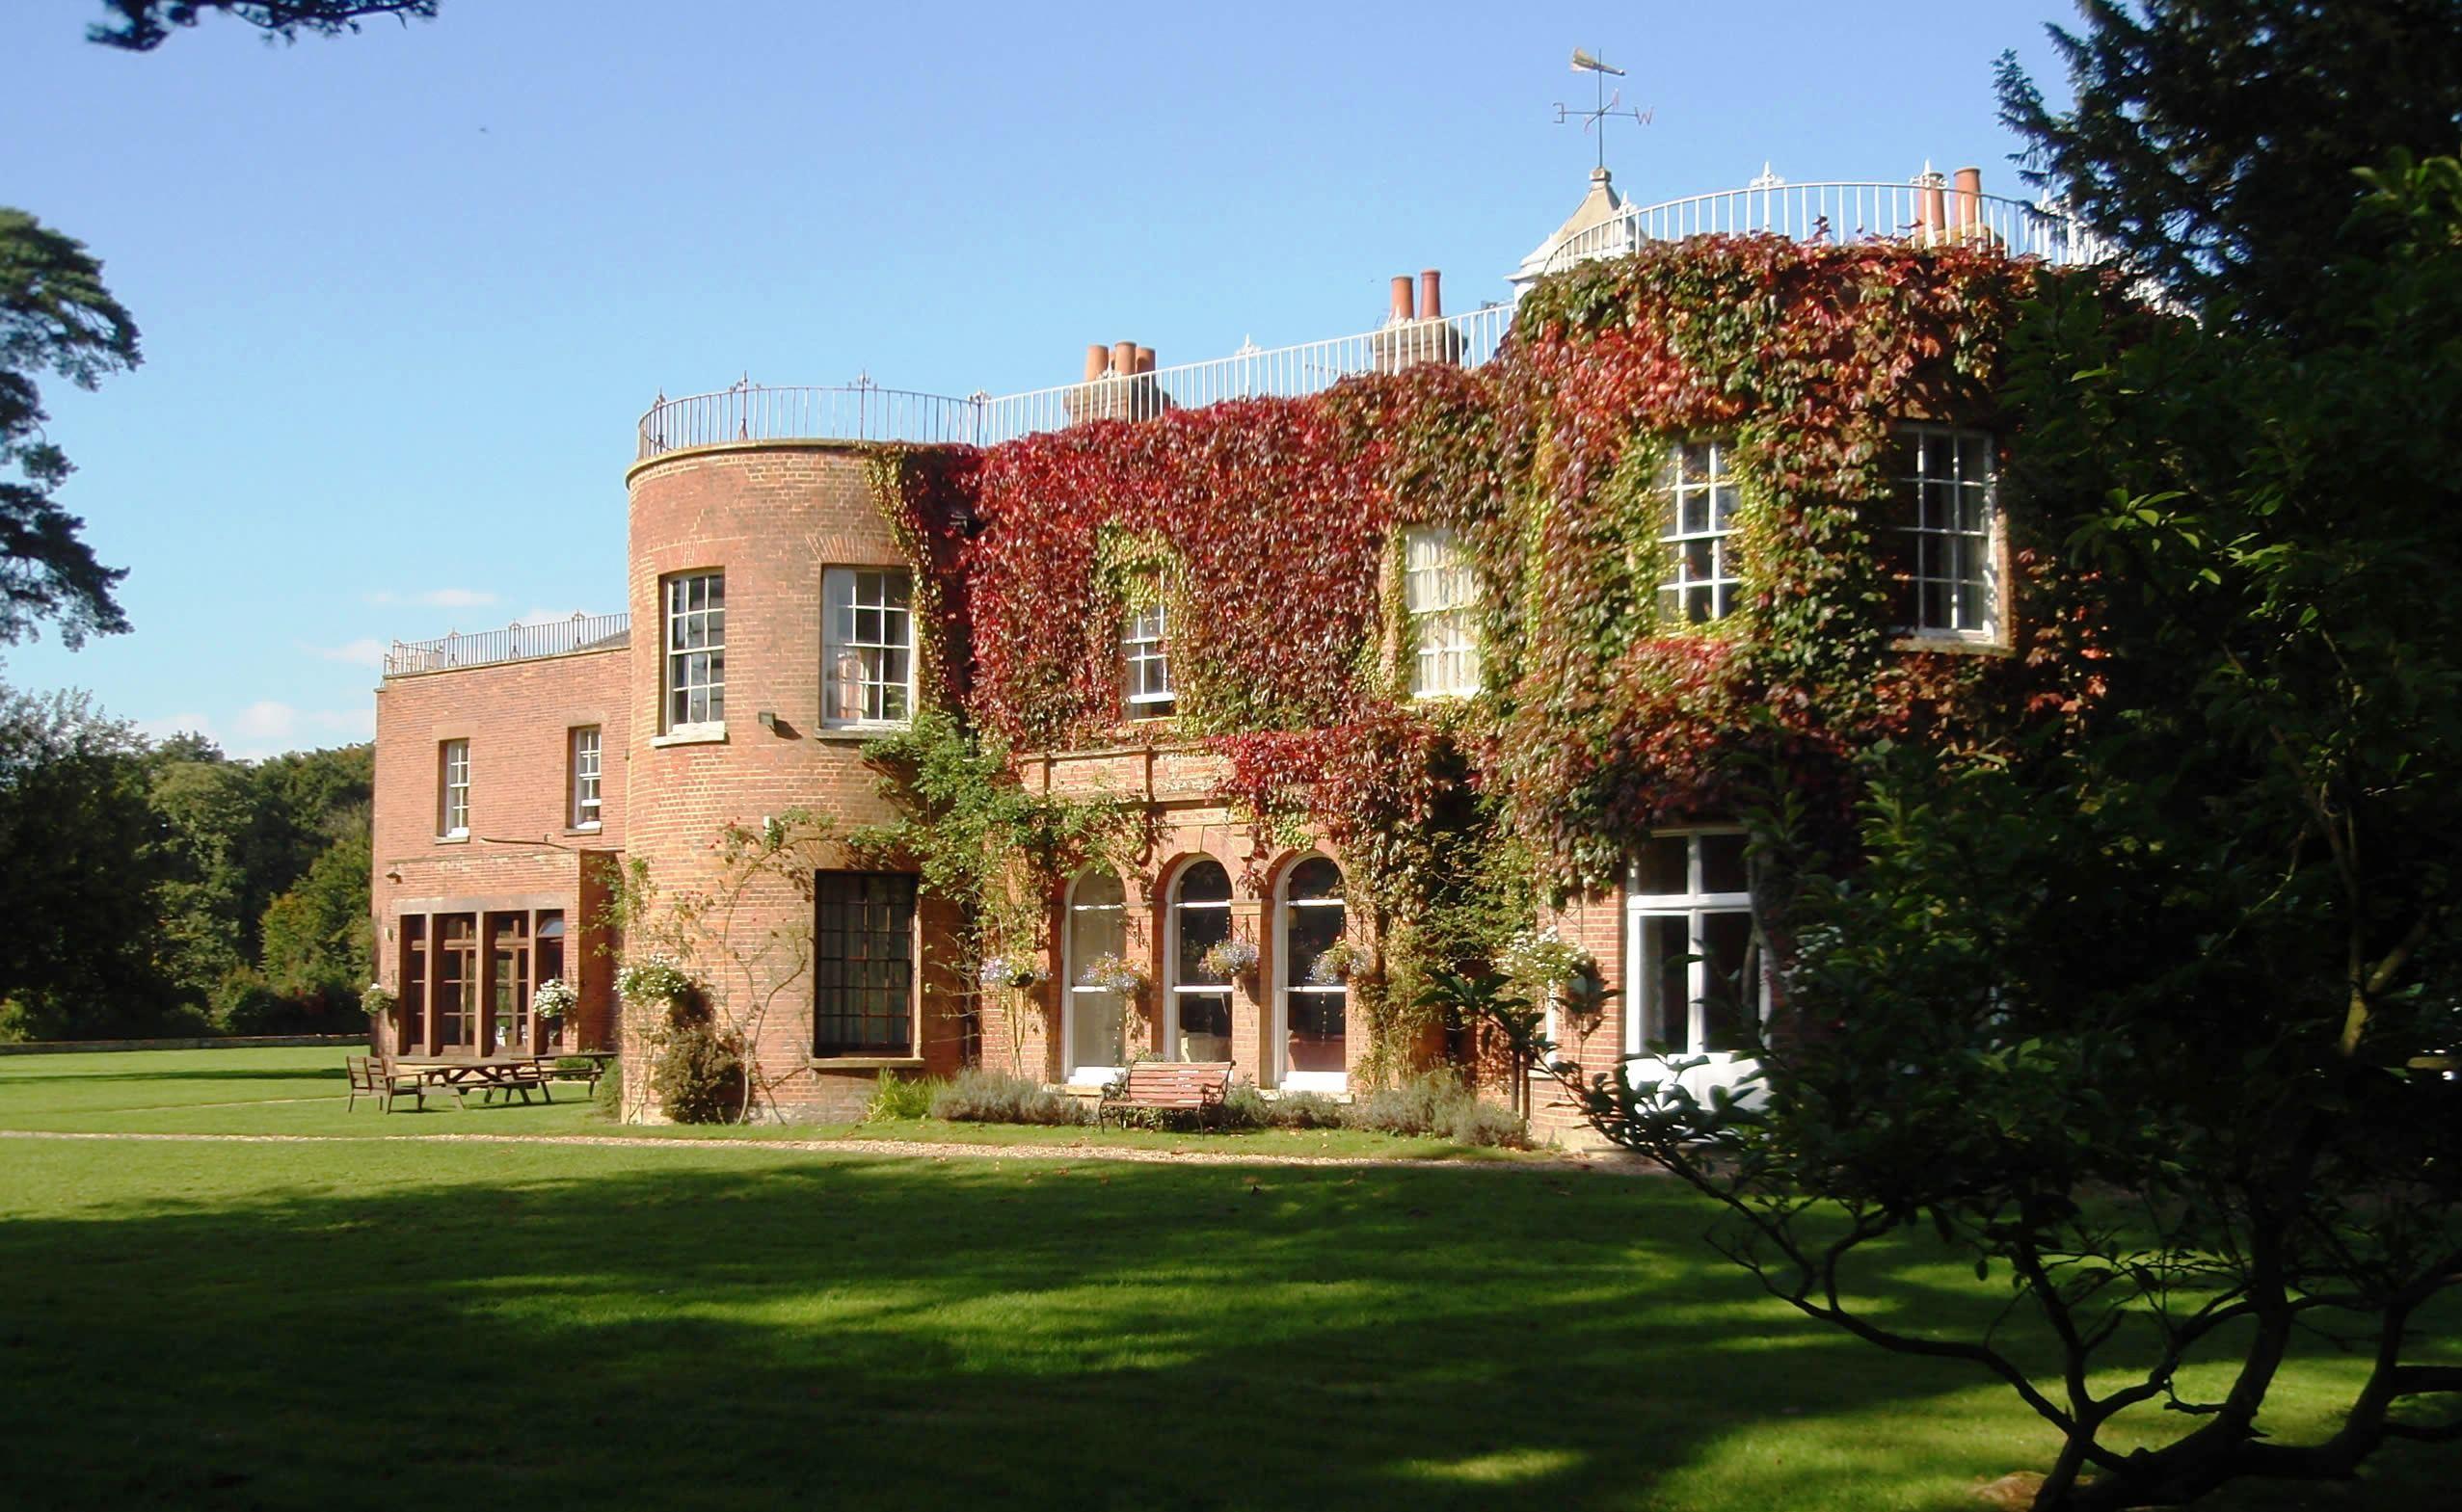 St Katherine's, Parmoor